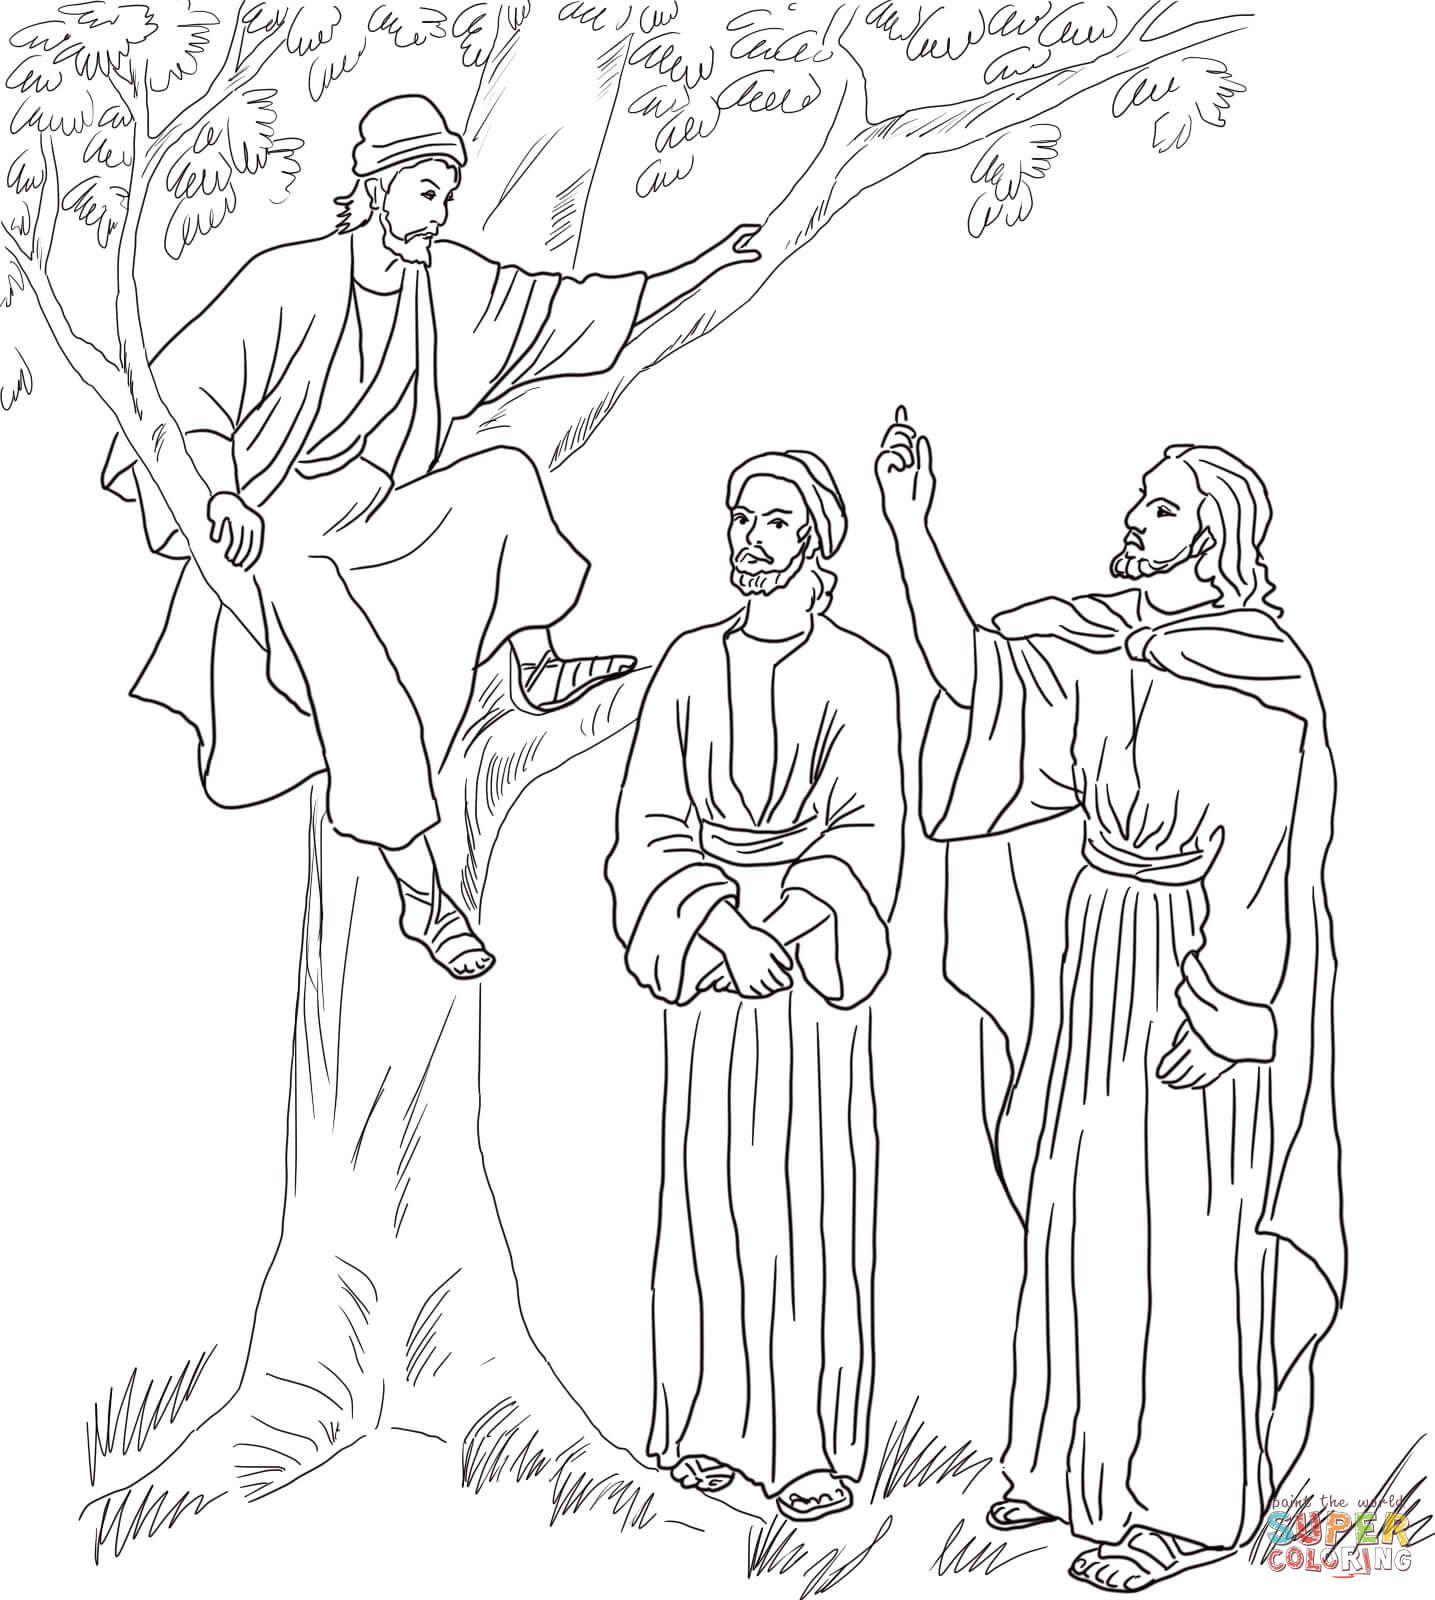 Jesus Meets Zacchaeus Coloring Page Jpg Obraz Jpeg 1435 1600 Pikseli Skala 57 Jesus Coloring Pages Bible Coloring Pages Bible Coloring [ 1600 x 1435 Pixel ]